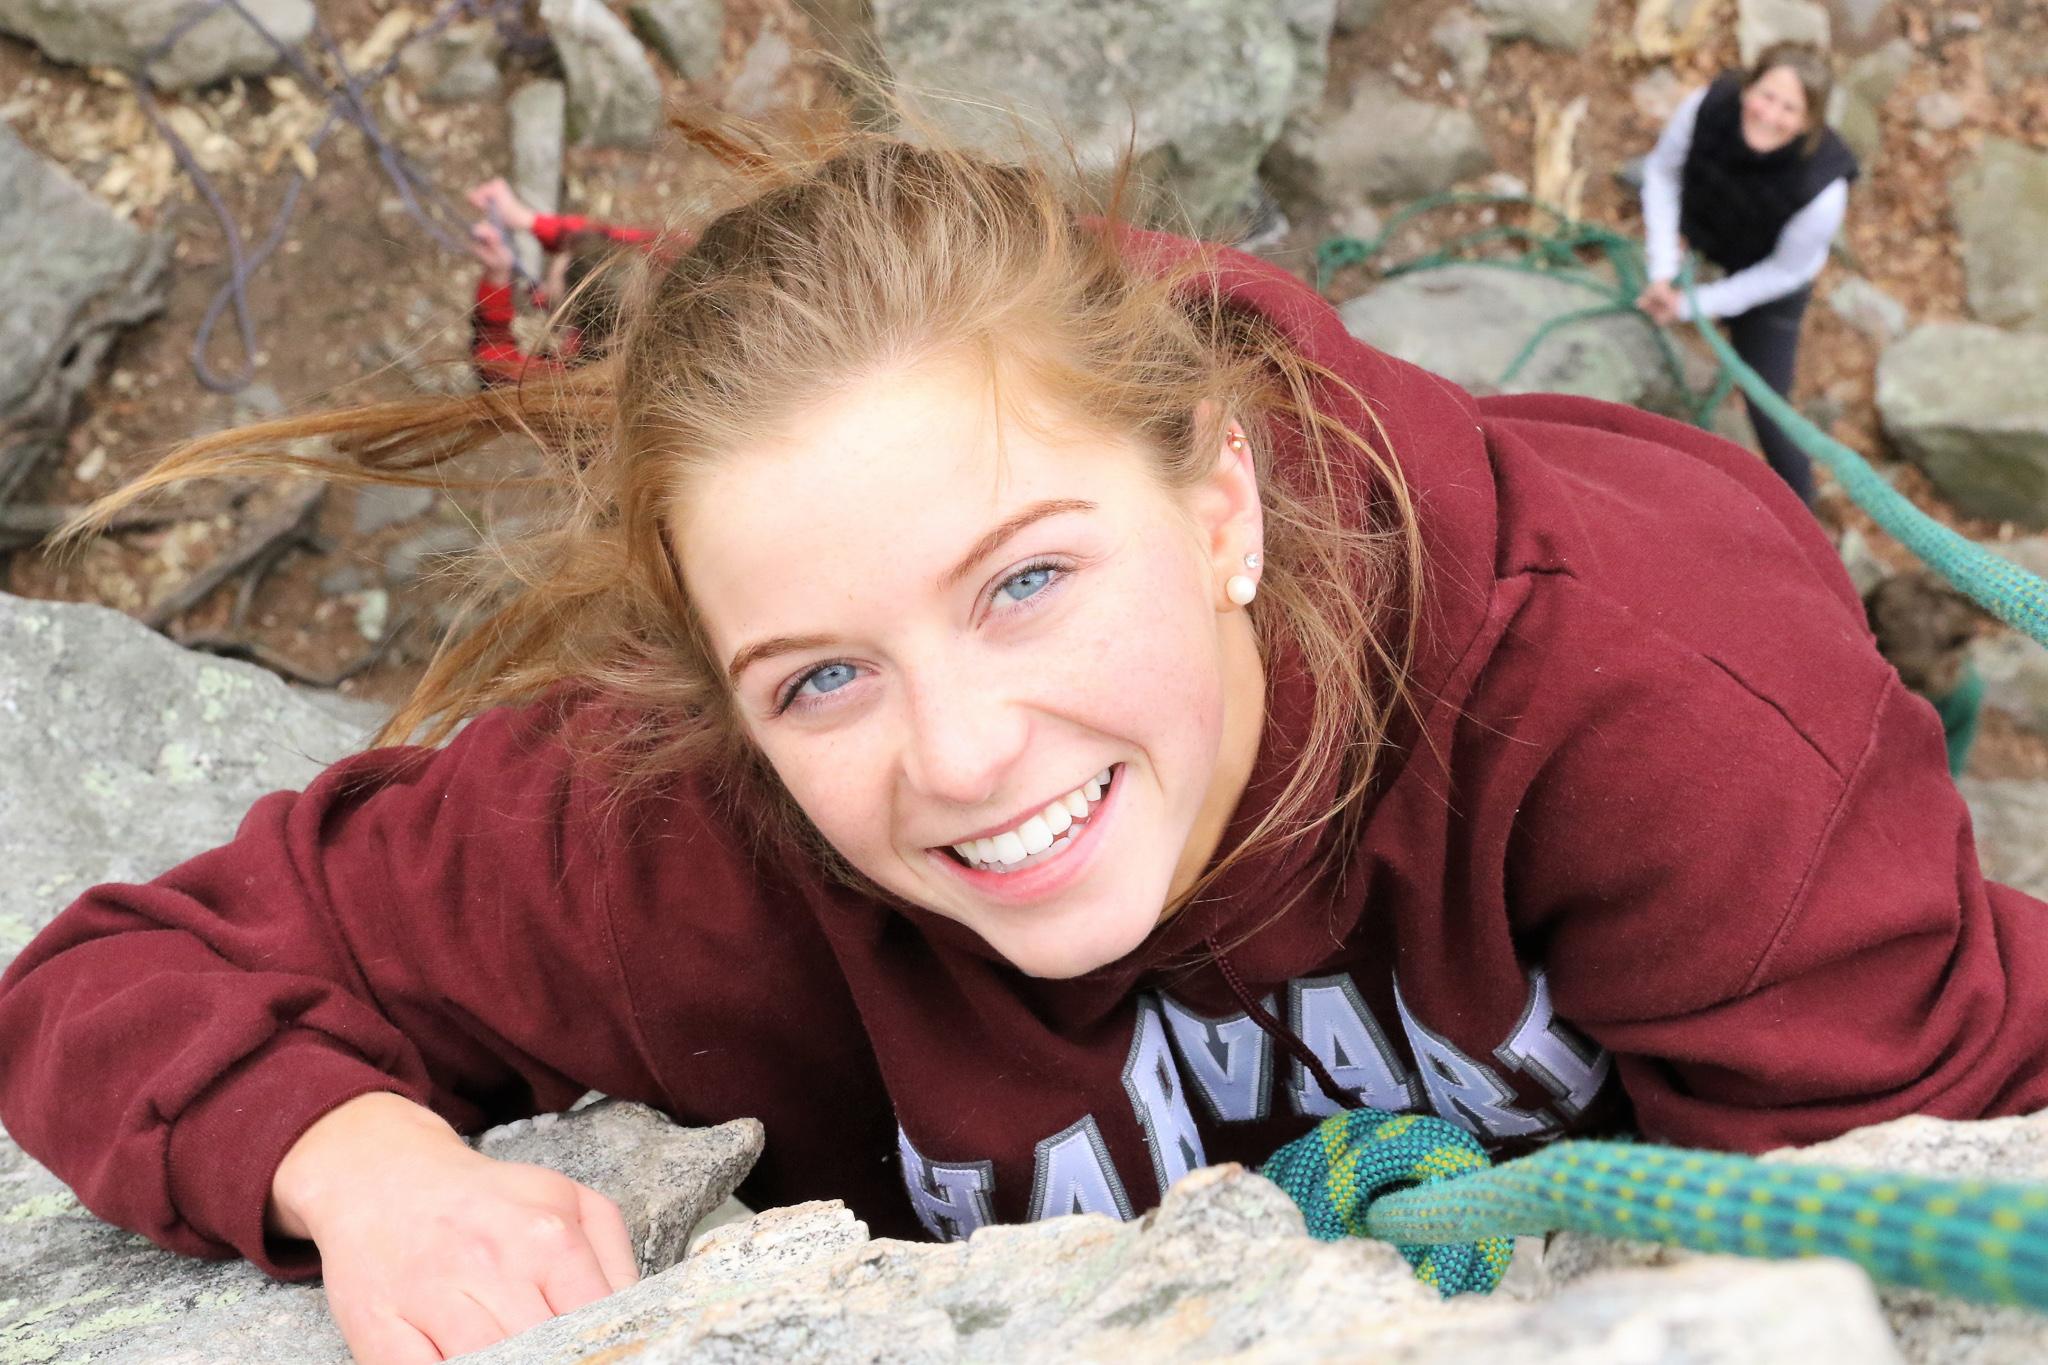 Pams Bday Climb 4-1-18 (41).jpg